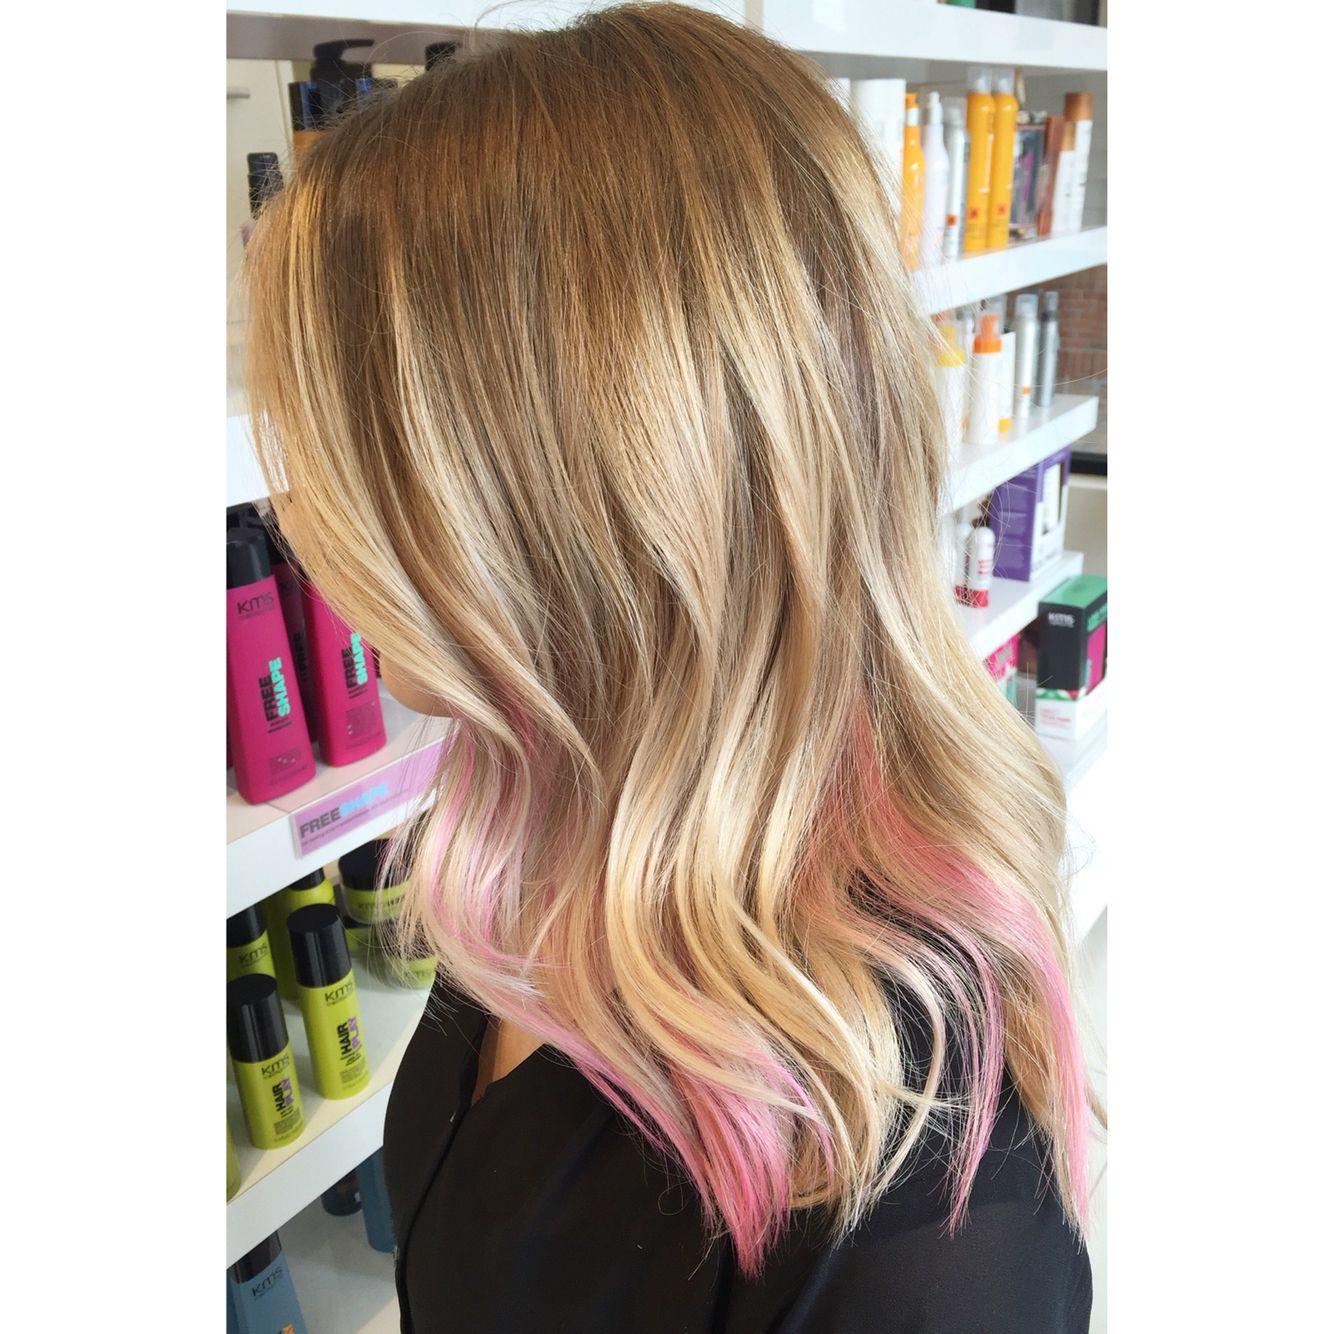 Soft Blonde Balayage With A Peekaboo Of Pastel Pink Pink Blonde